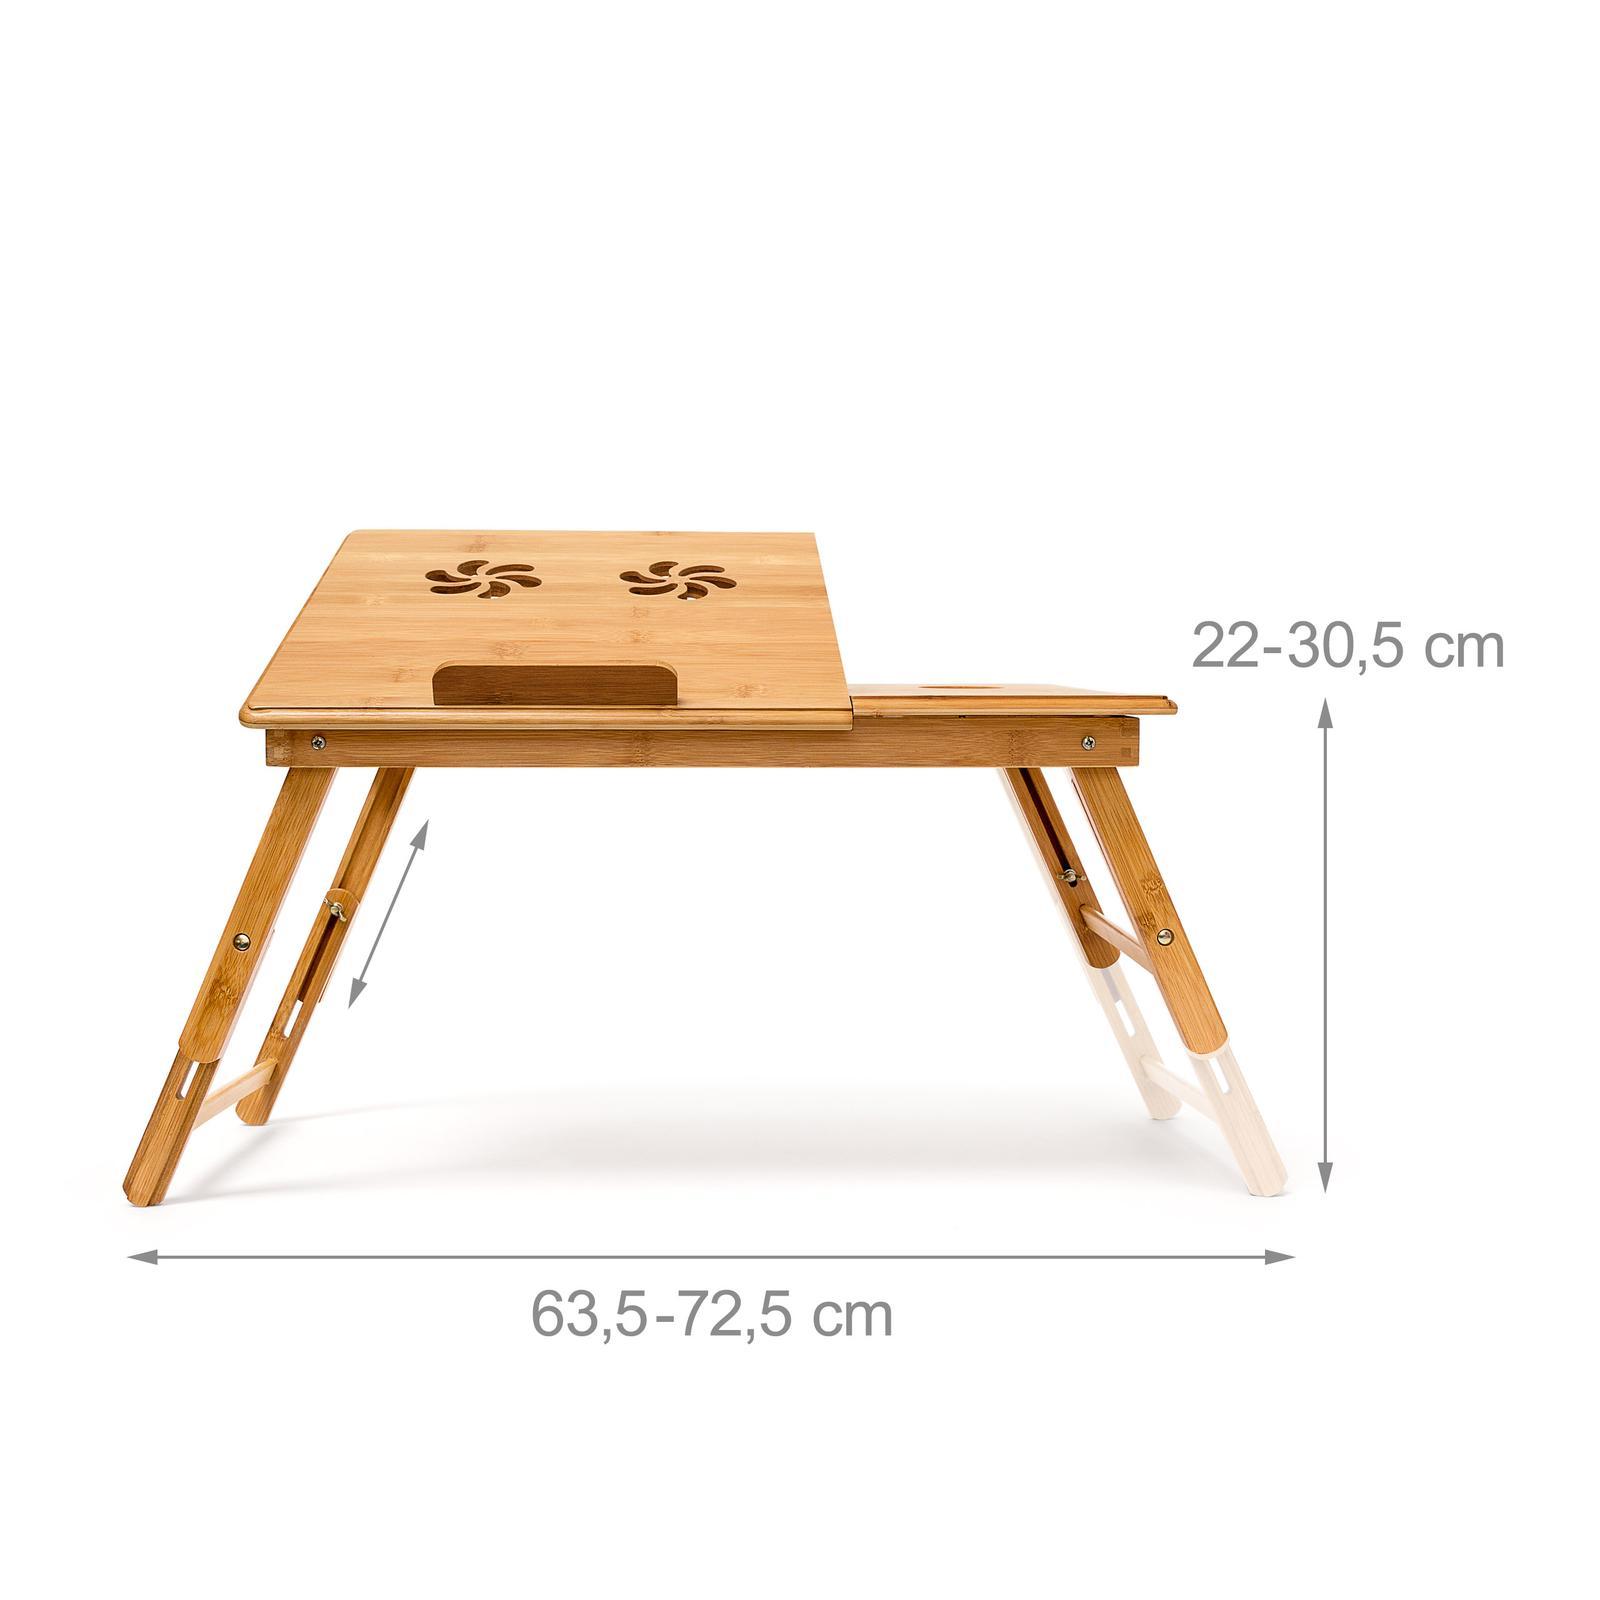 Stolík pre notebook, raňajkové stolíky - Obrázok č. 24